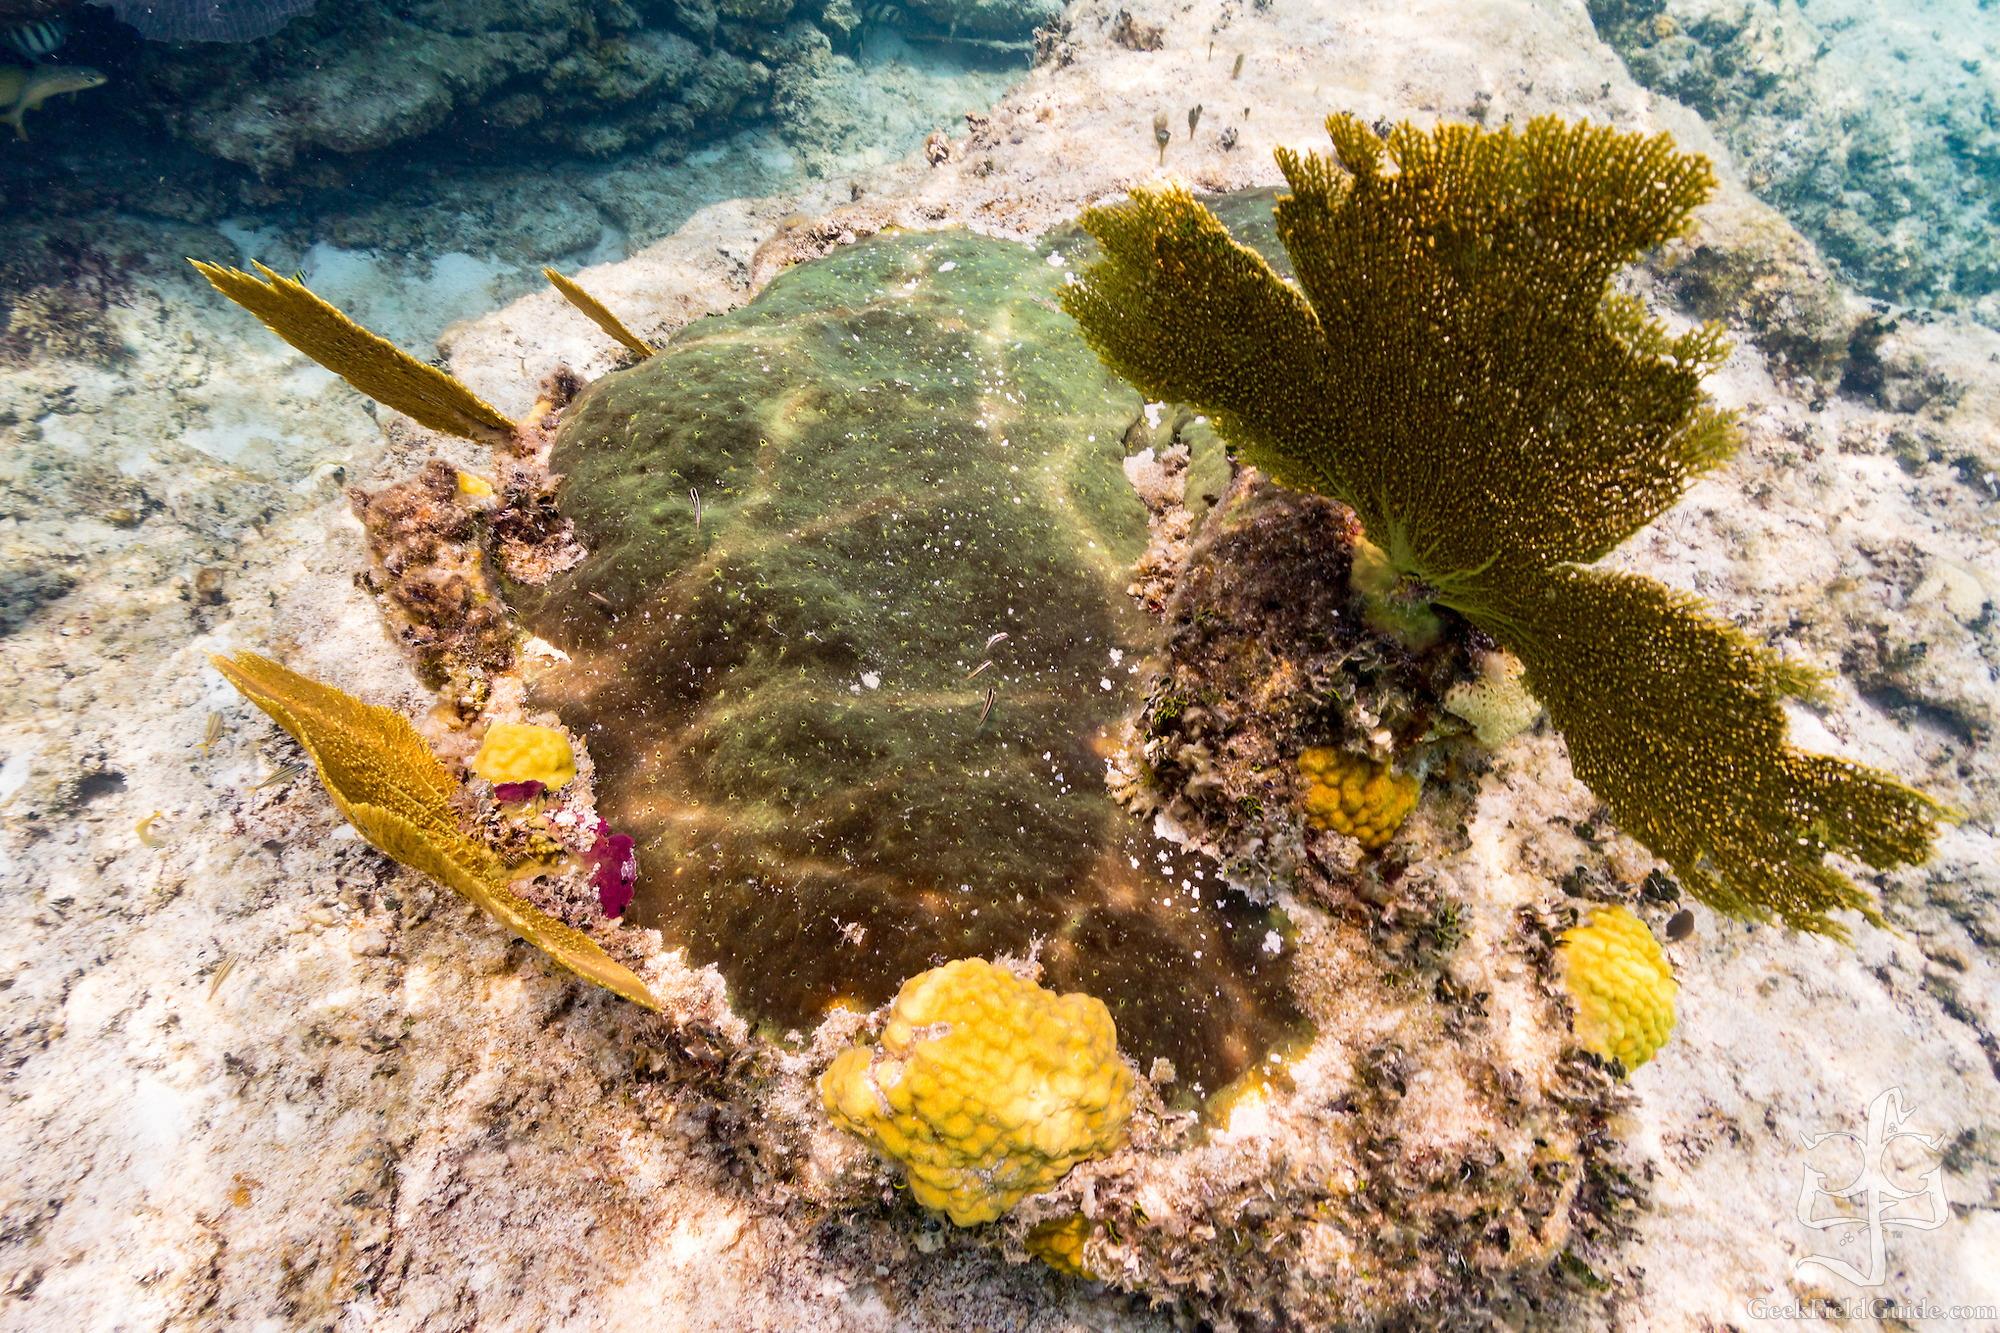 Fans, corals, and sponge (Warren Schultz)